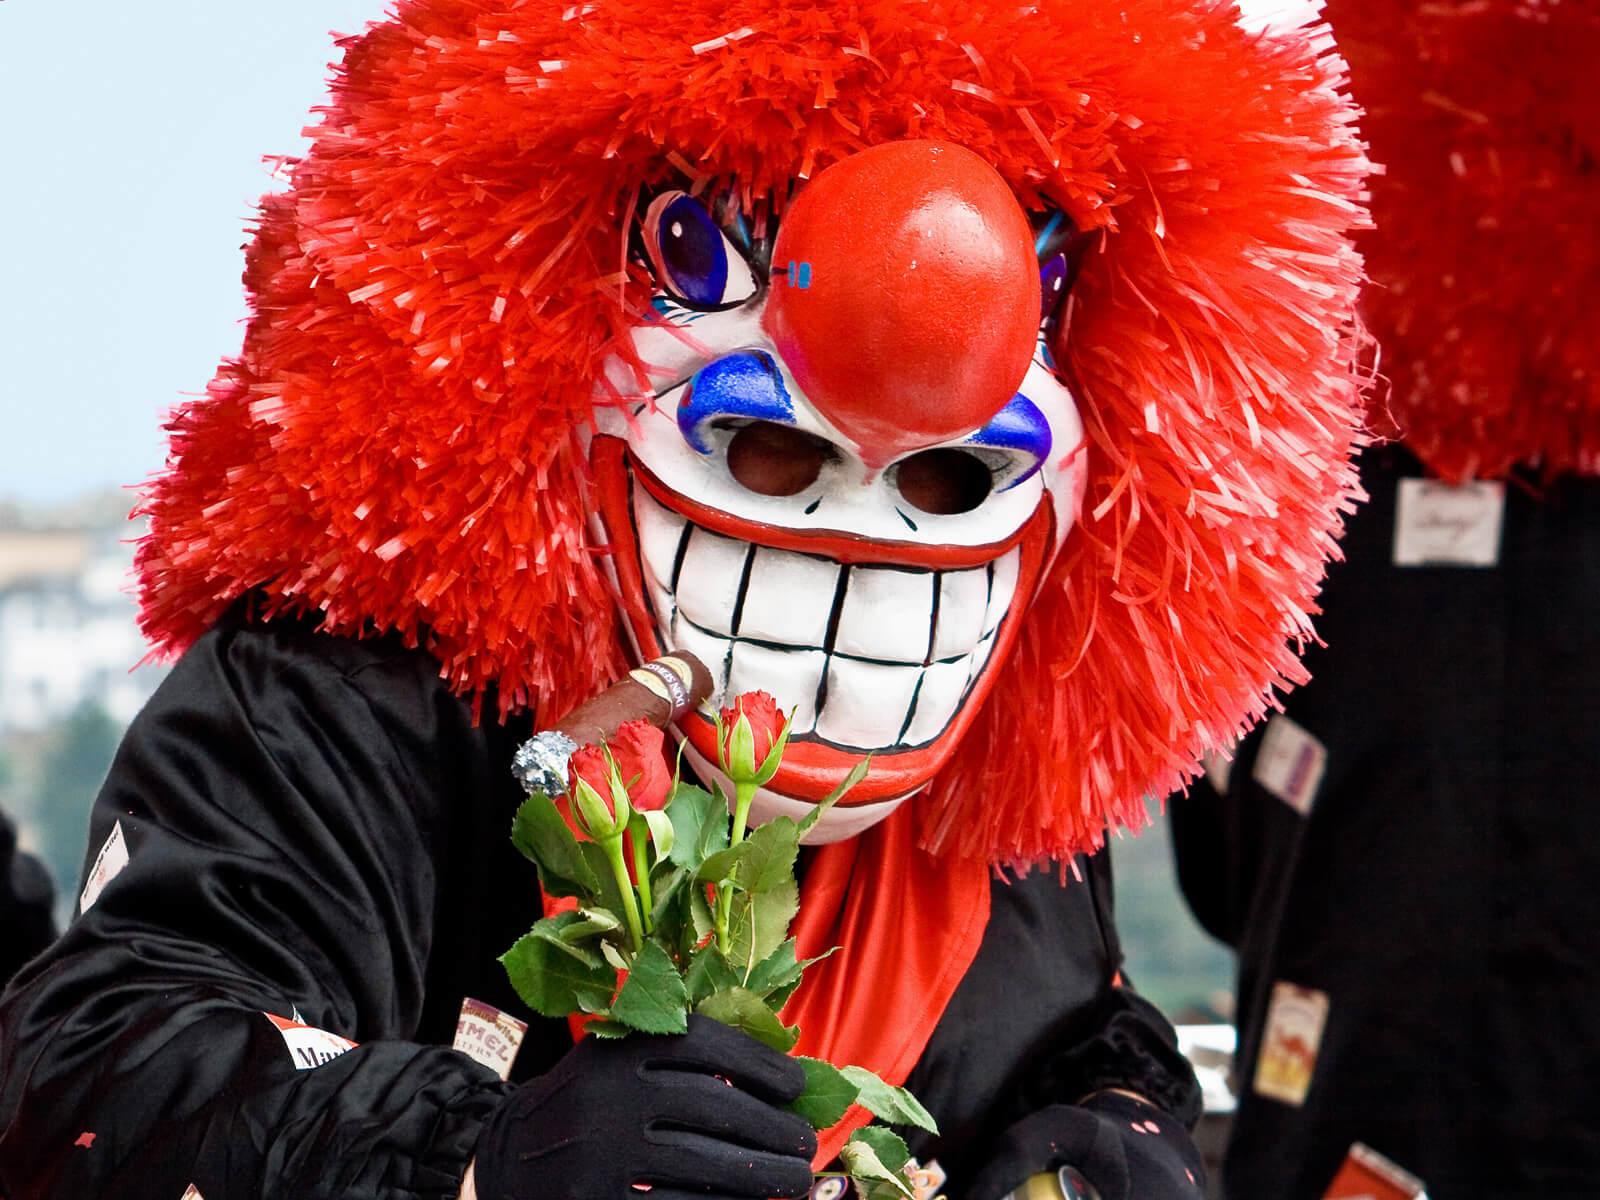 Waggis character at the Basel carnival